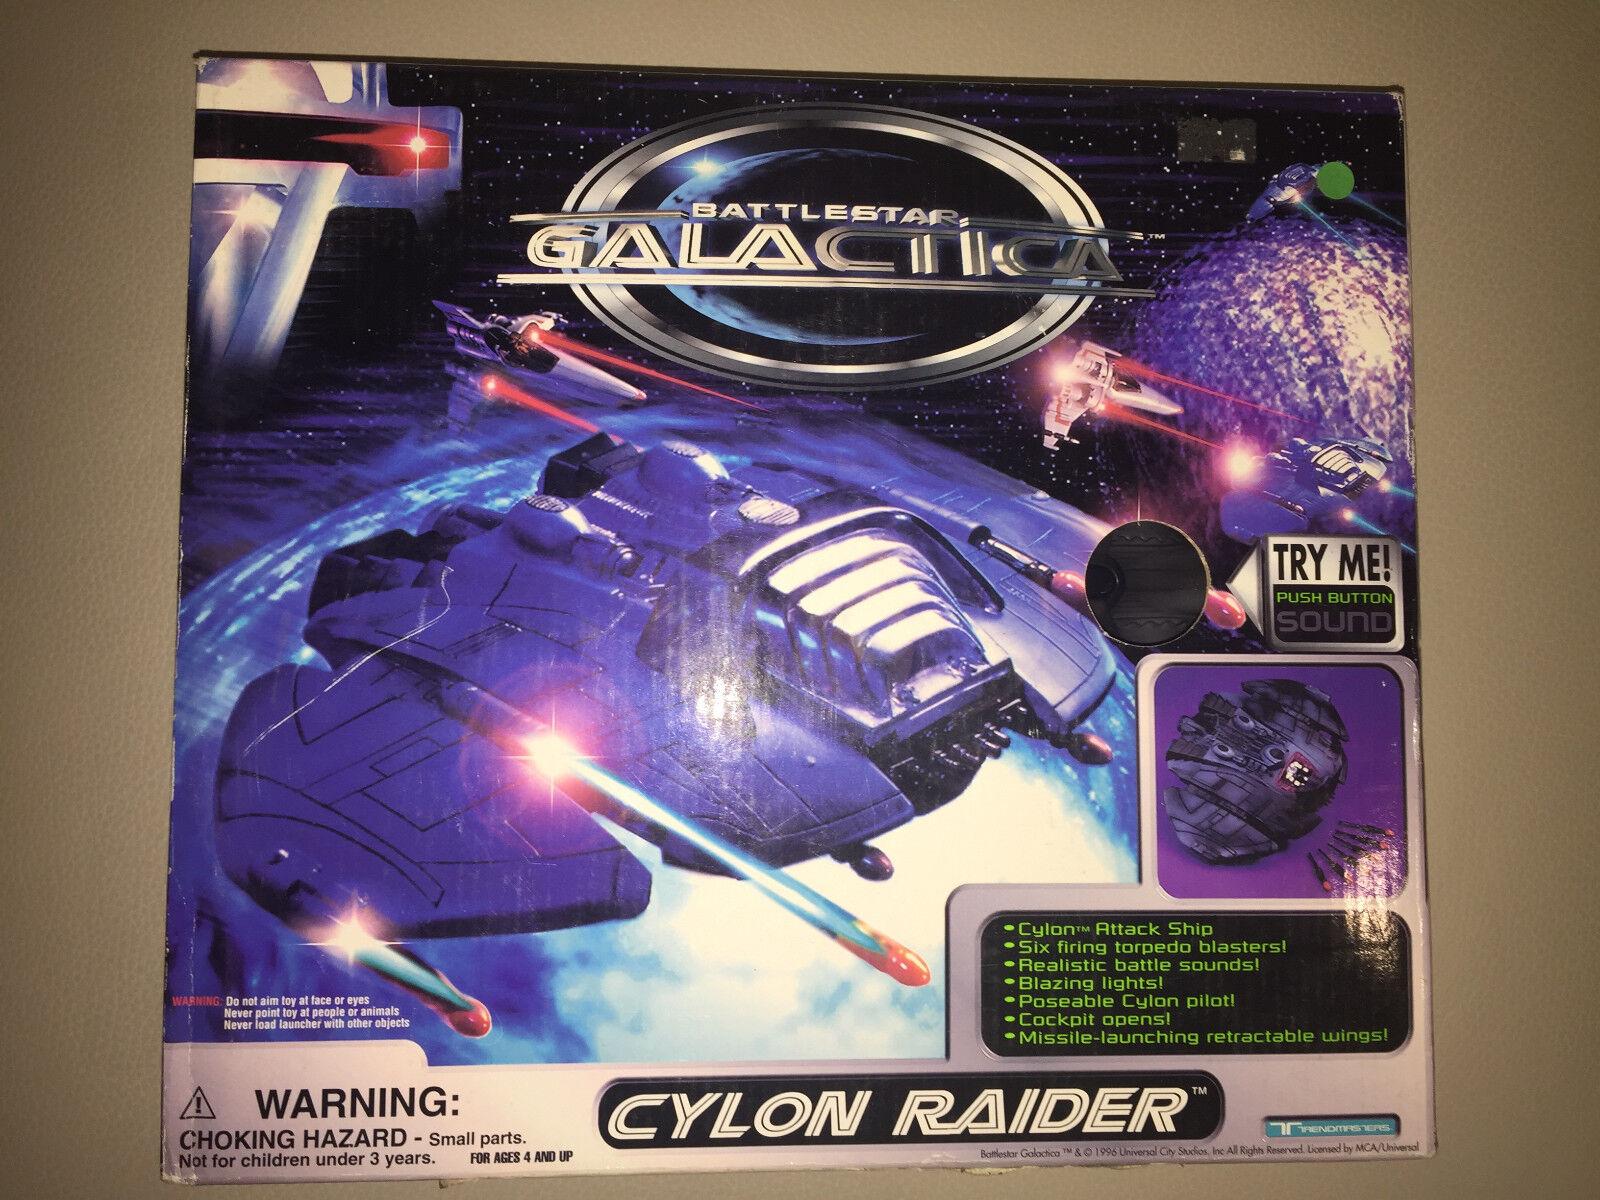 Battleestrella Galactica Cylon Raider suono Battleship modello Suoni Tremaster giocattoli